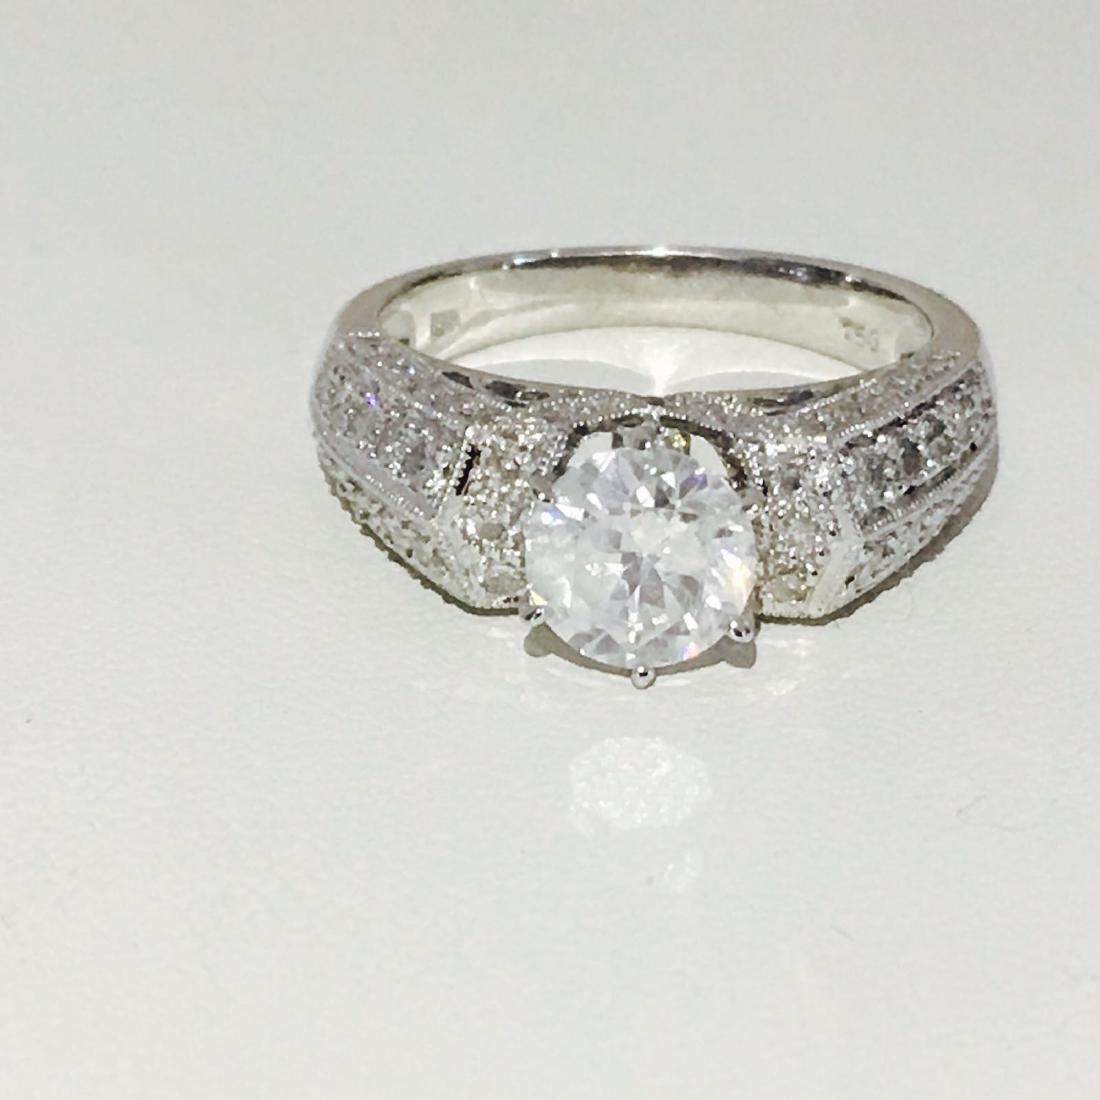 18K White Gold, 2.10 CT Diamond Engagement Ring